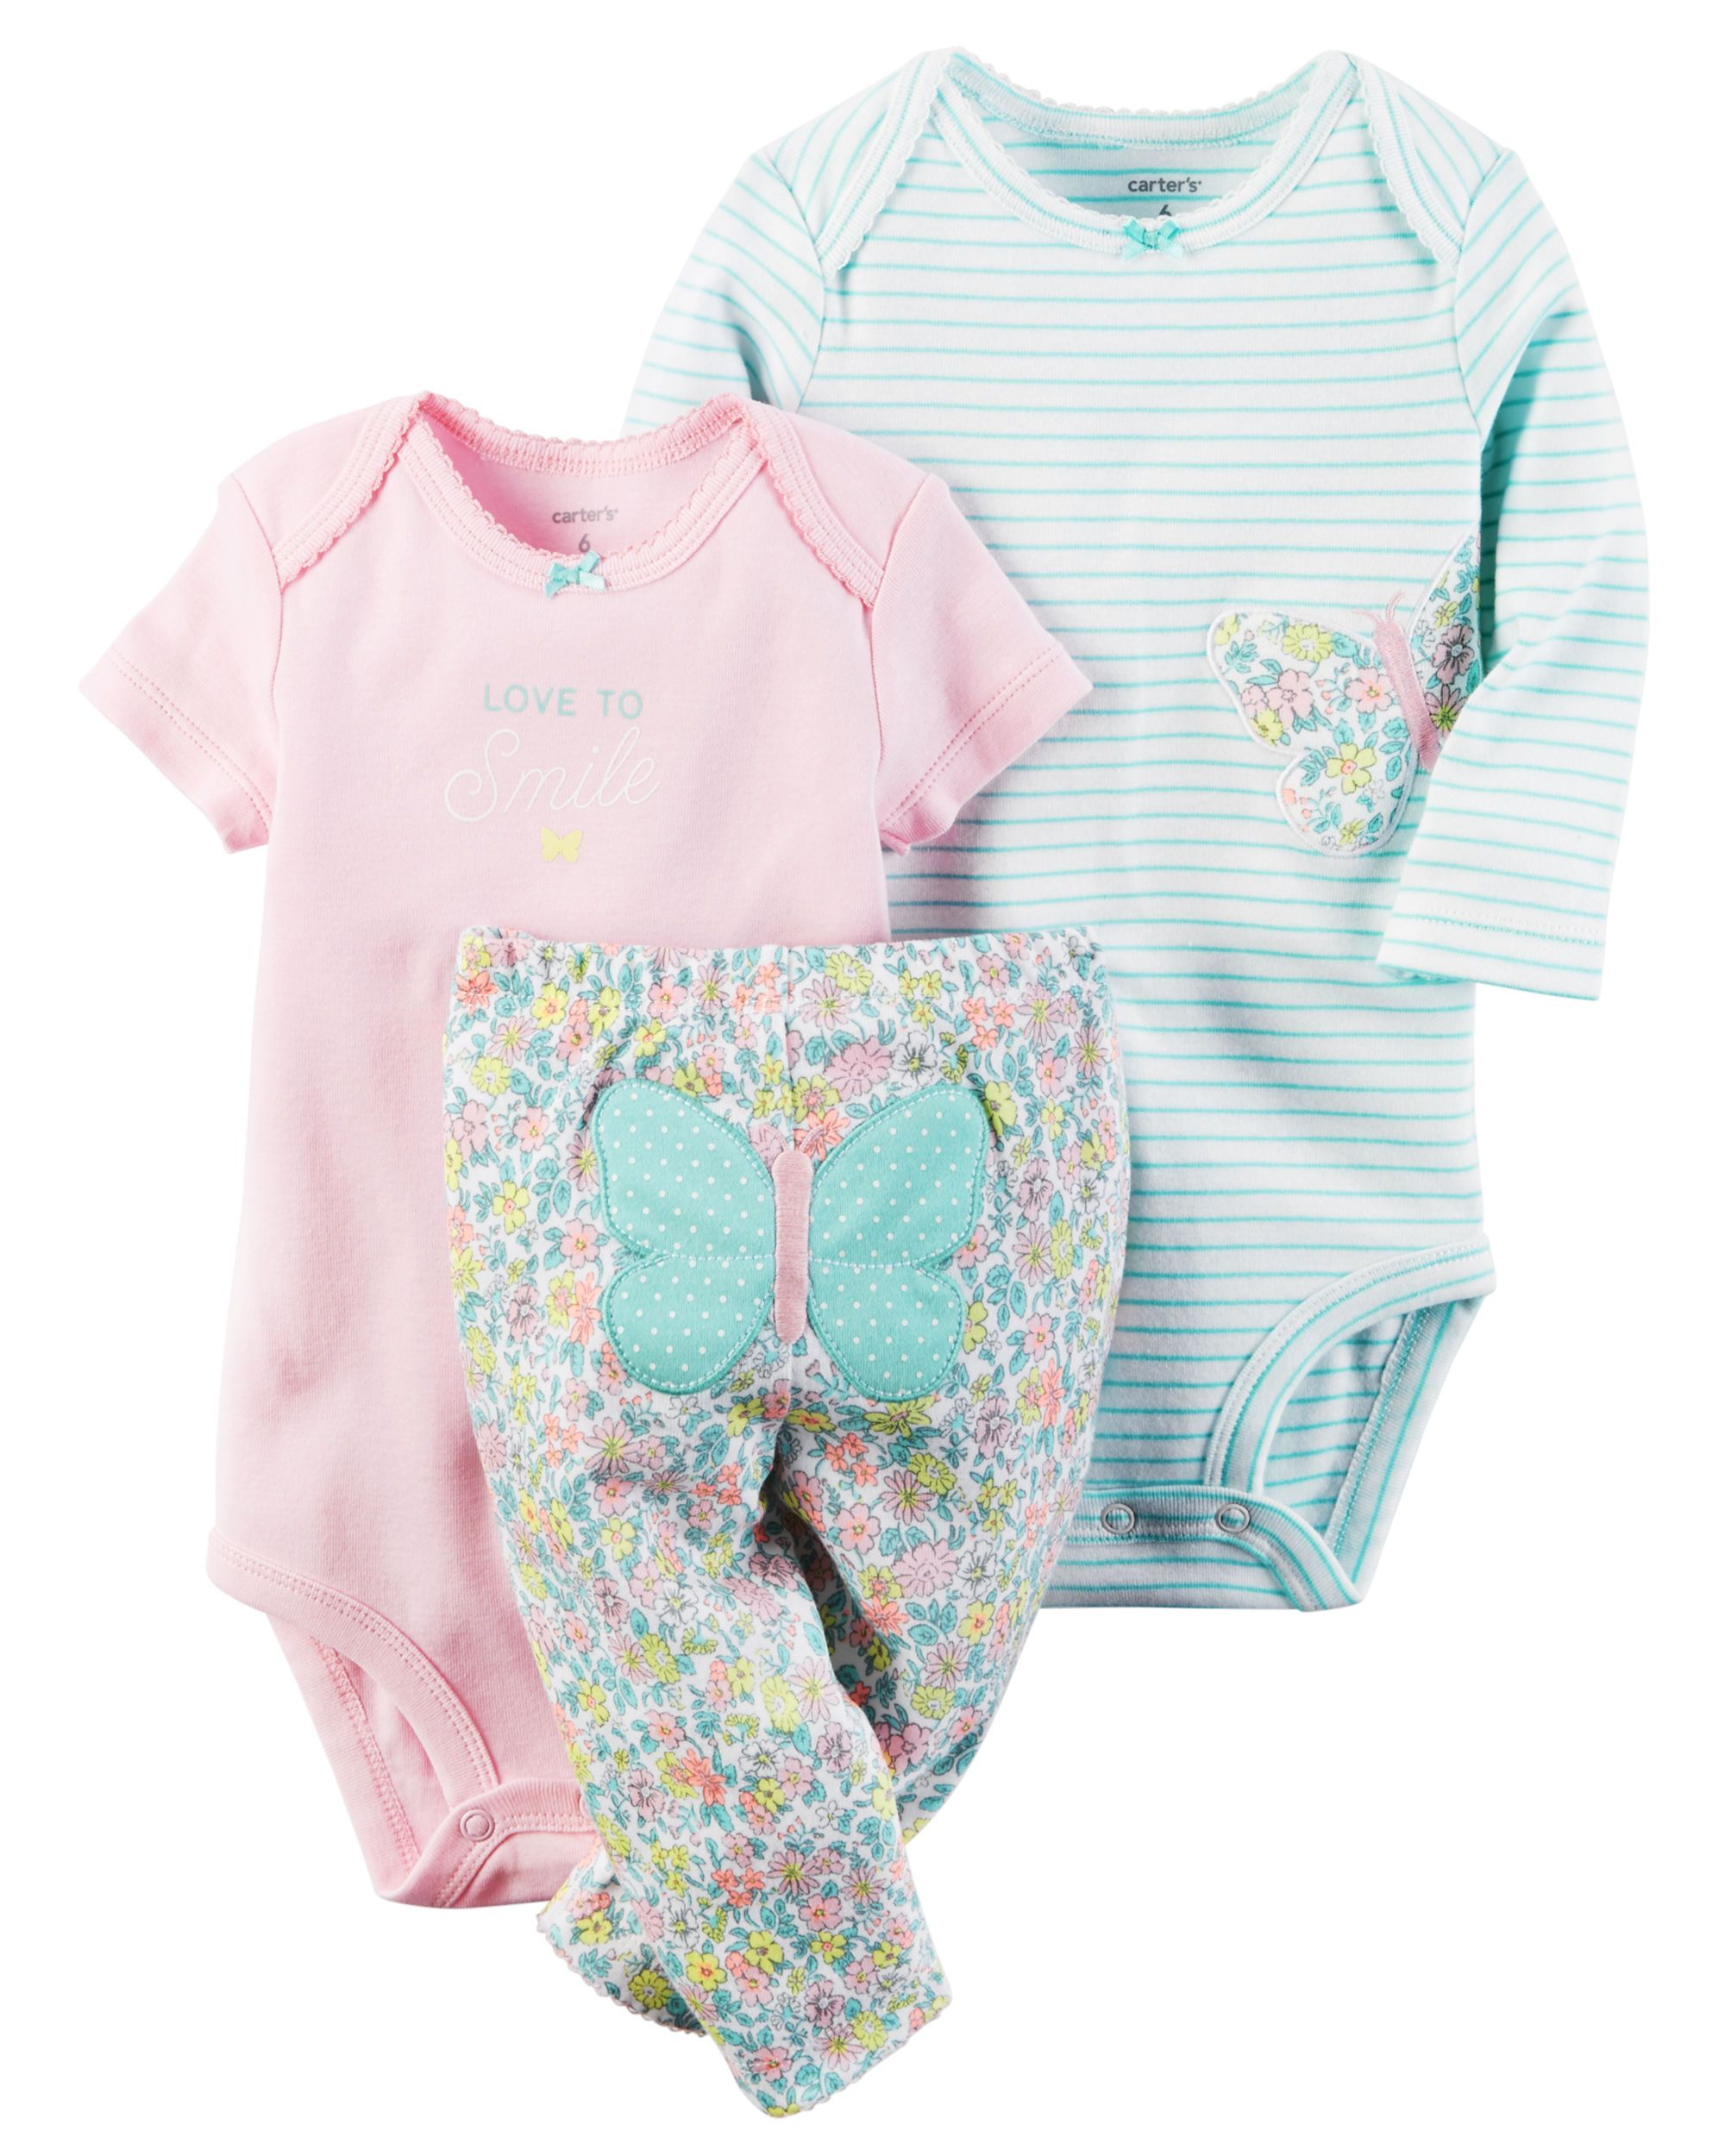 08619586faa9 Baby Girl 3-Piece Little Character Set   Carters.com   Maternity ...